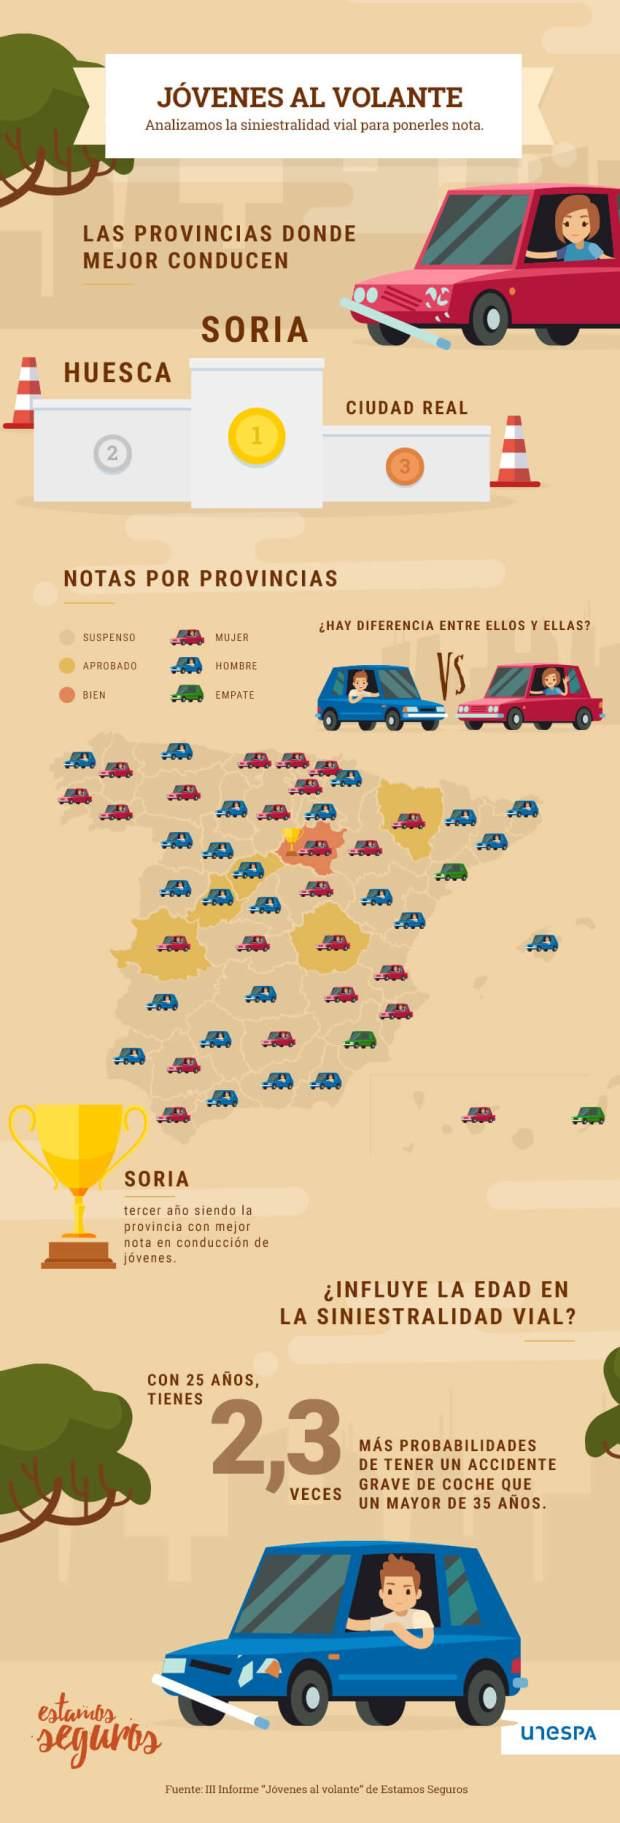 Infografia_jovenesalvolante-2